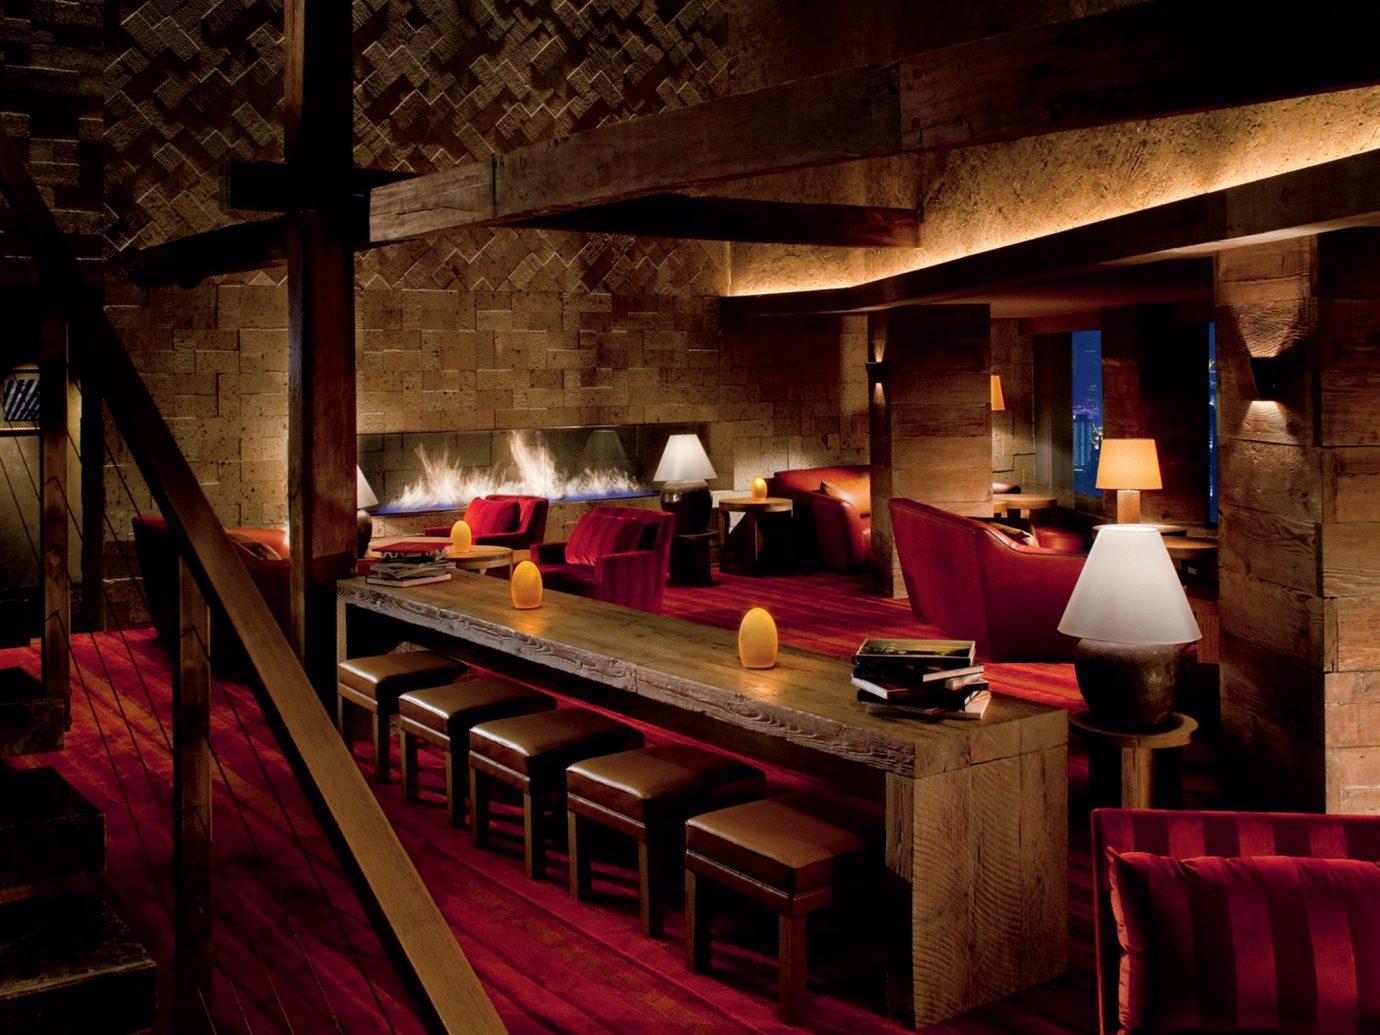 Bar Boutique Hotels Dining Drink Eat Living Lounge Luxury Luxury Travel Modern indoor restaurant interior design screenshot basement several